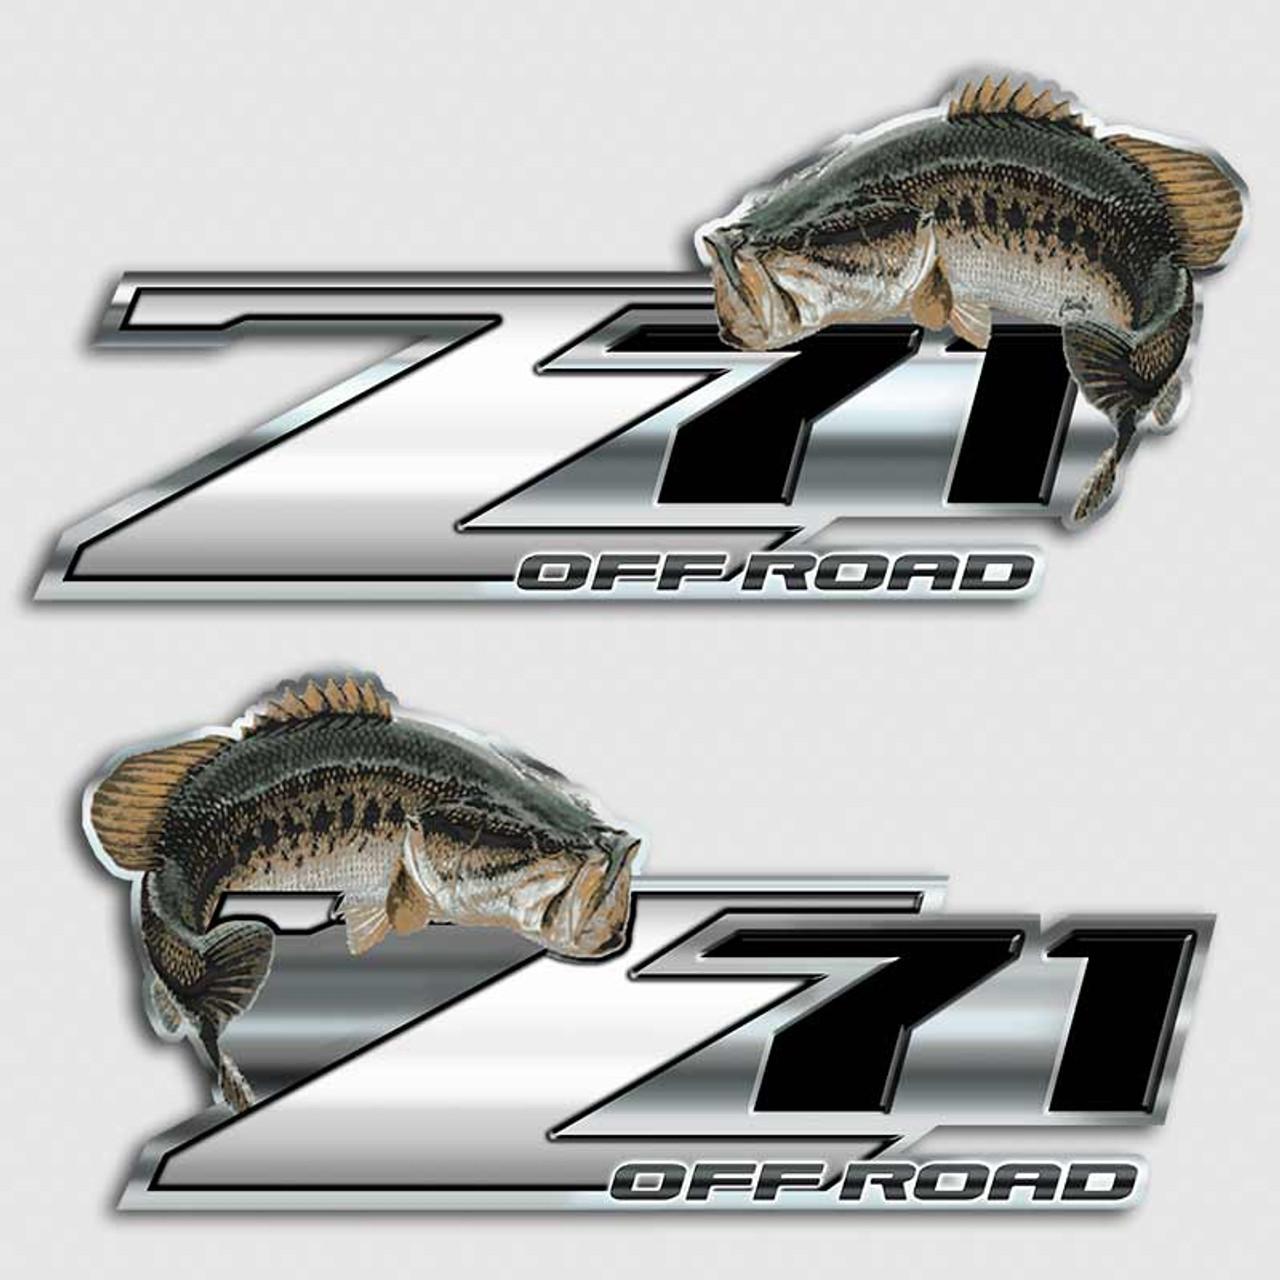 Bass Fishing Z Chevy Truck Decal Silverado Fish Sticker - Fishing decals for trucks